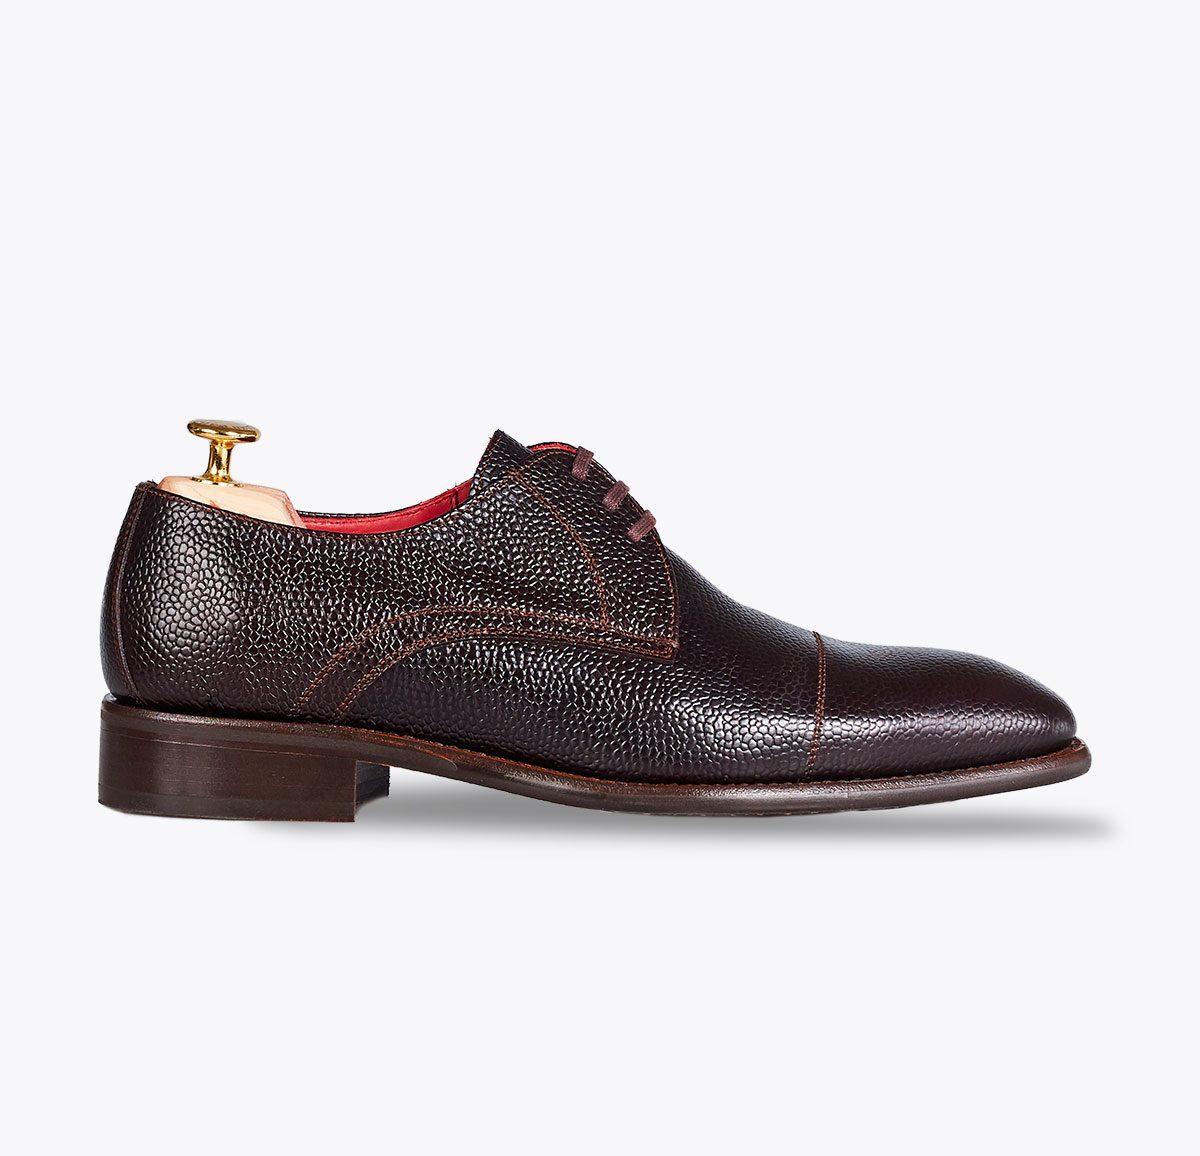 Zapato Baly ébano hecho a mano en mandalashoes, Santanyí Mallorca. Hand made shoes. Nach Mass Schuhe